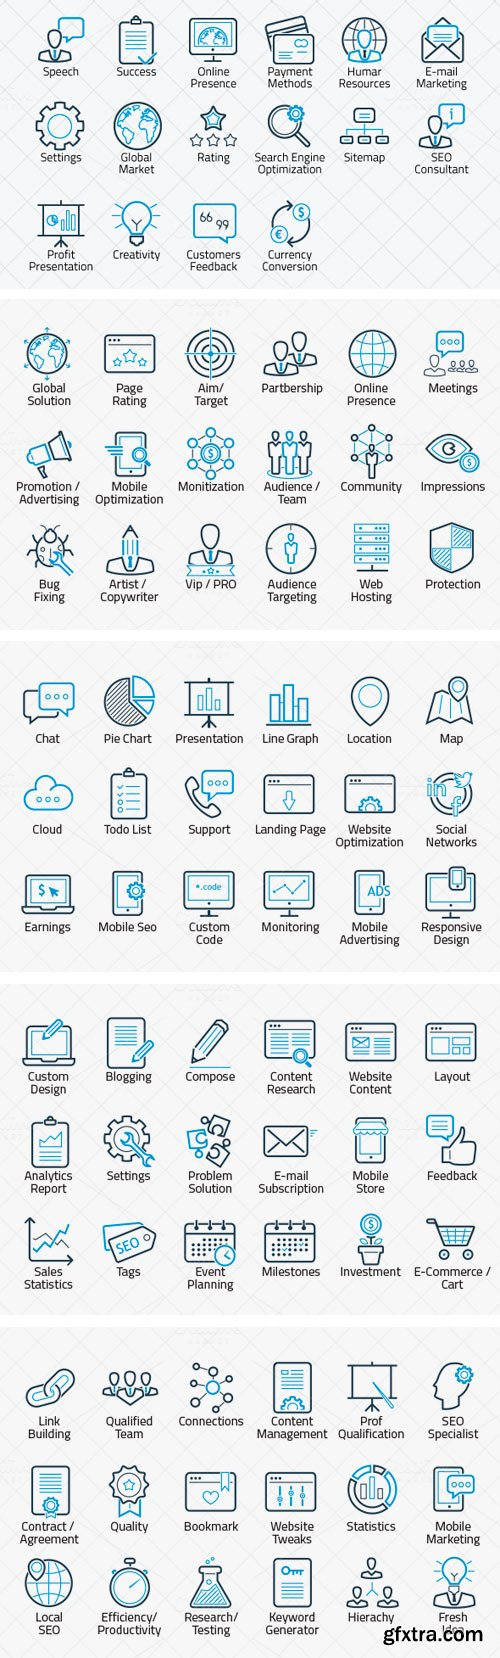 CM 120022 - ikooni outline: SEO, Web & Marketing